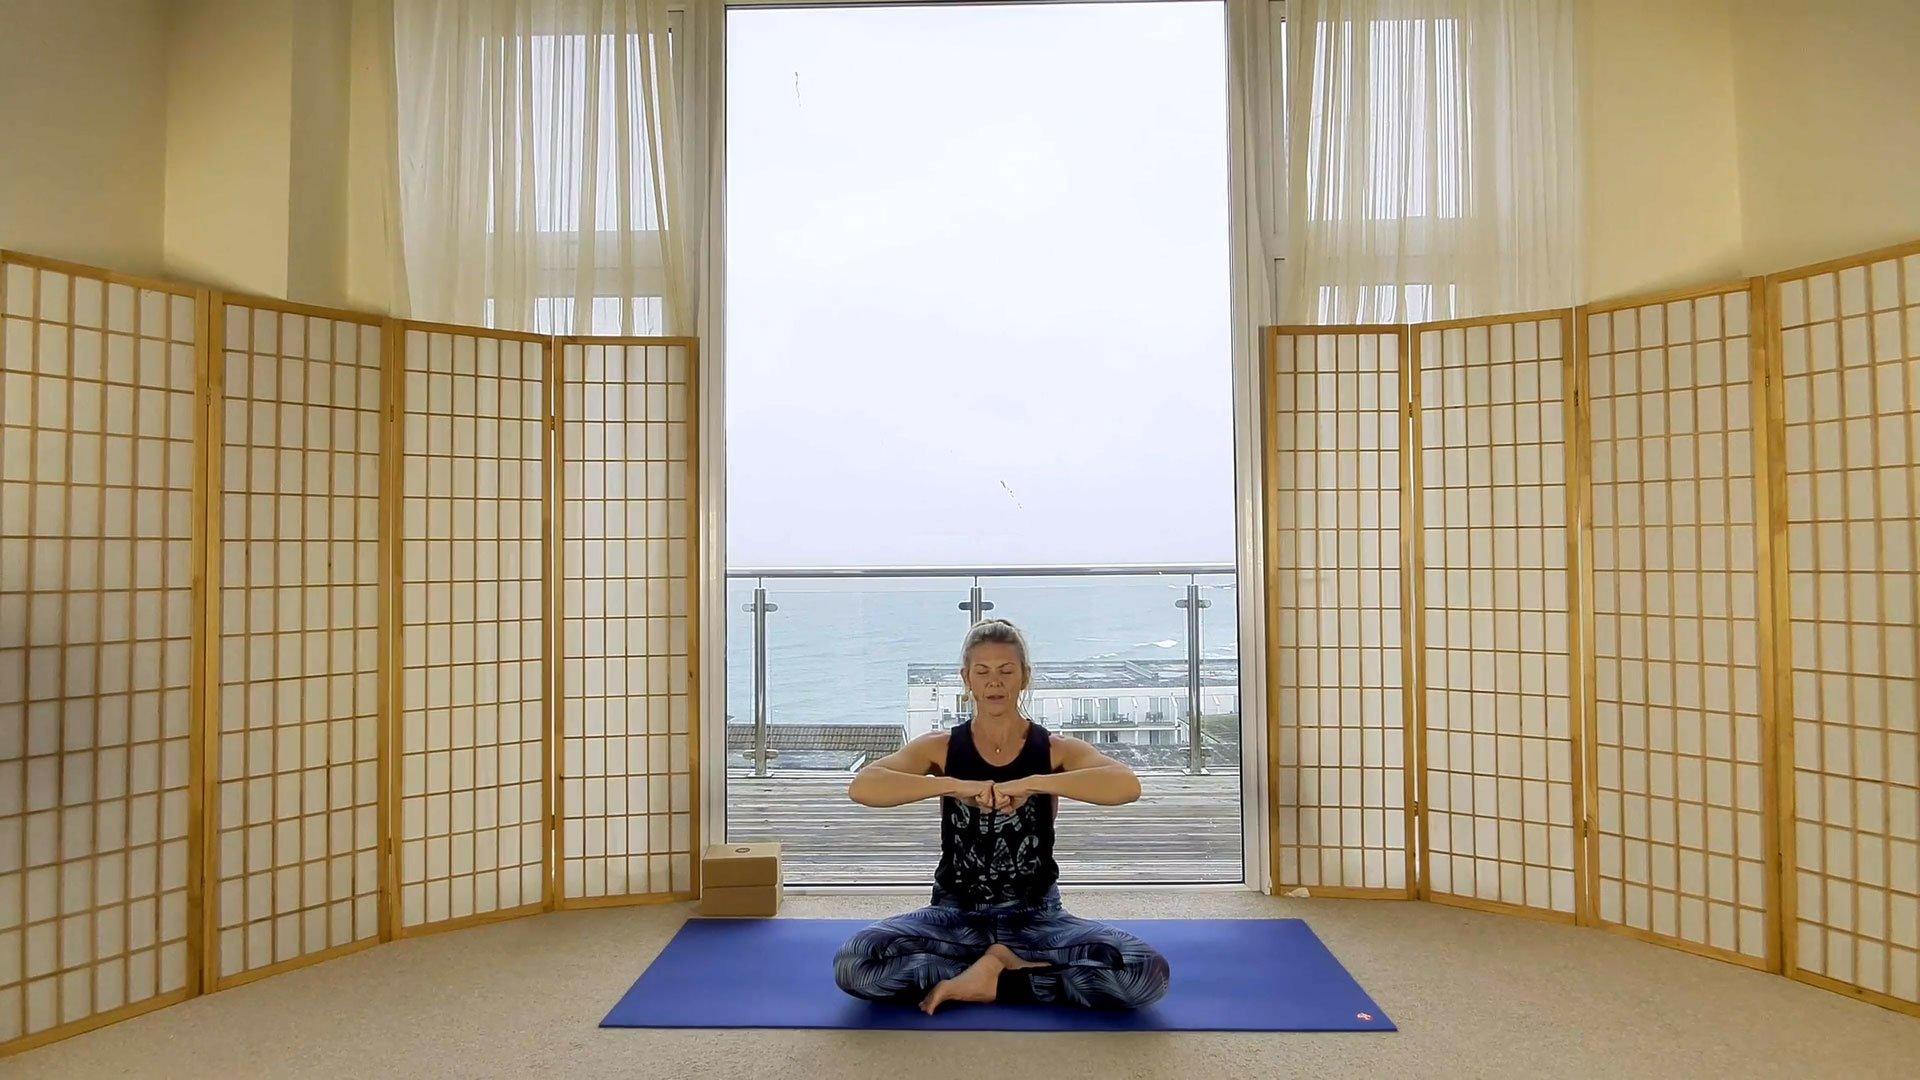 Energise yoga on demand online fist bumps